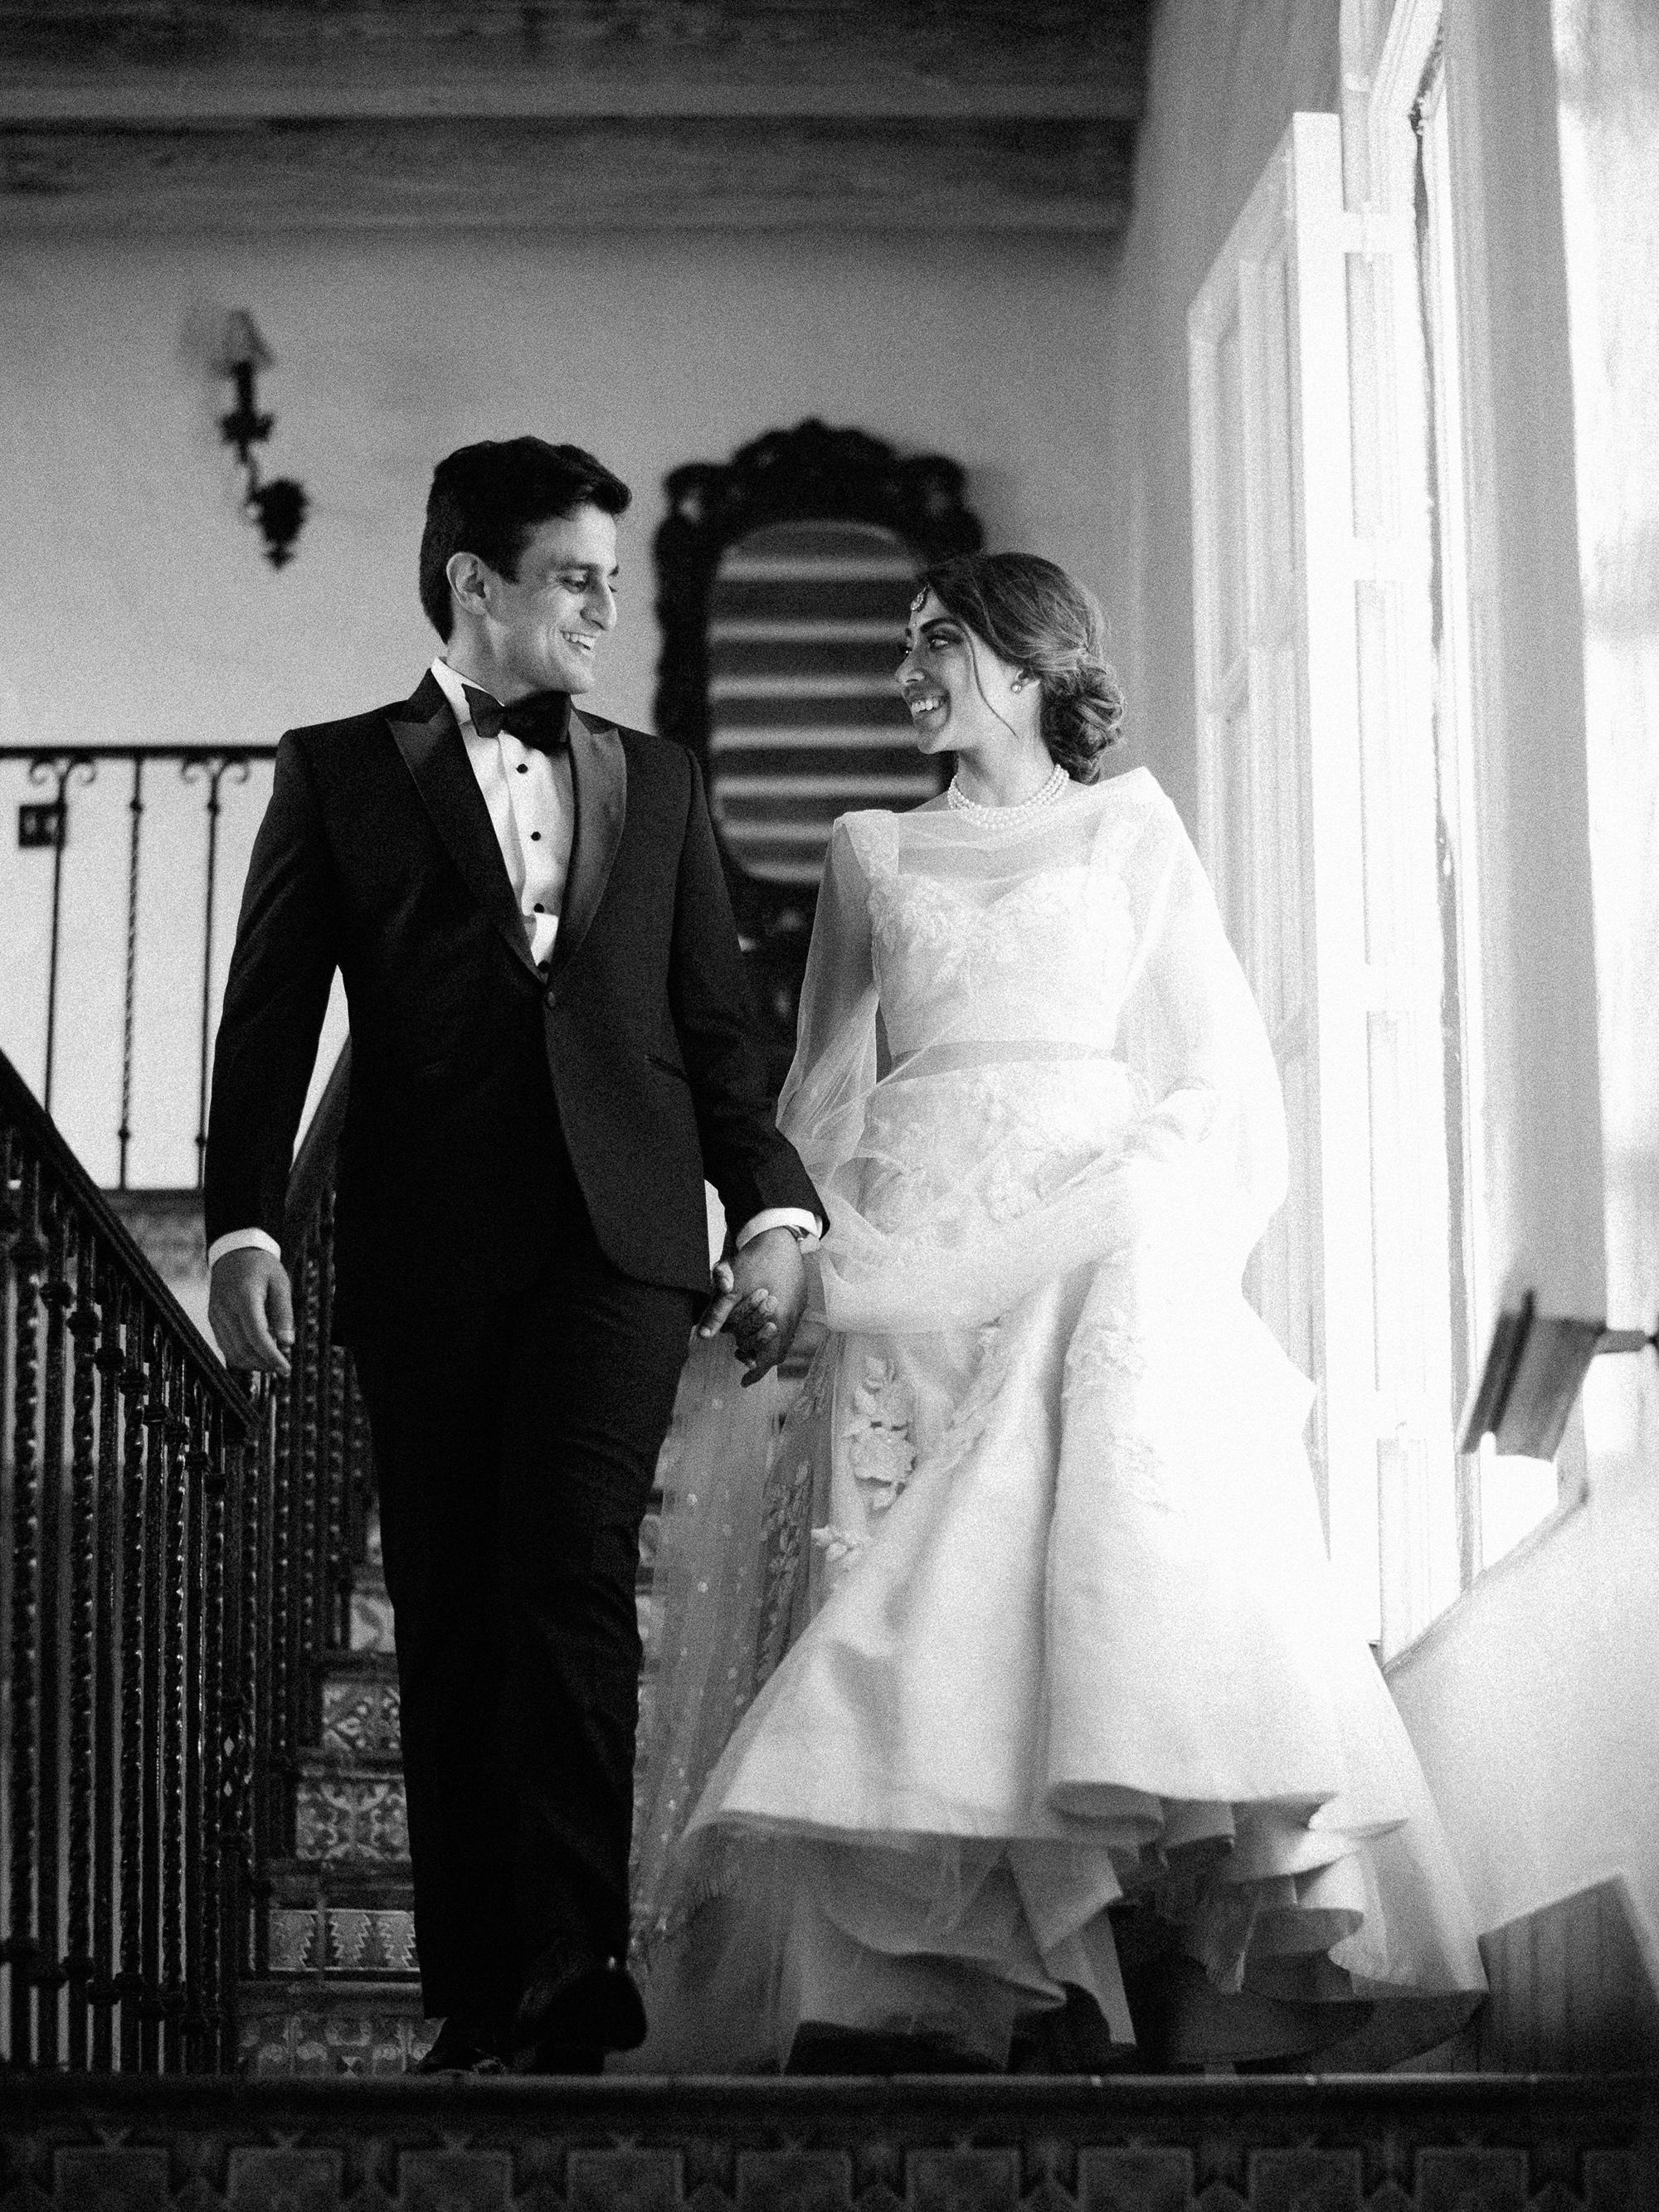 anuja nikhil wedding ceremony couple reception entrance